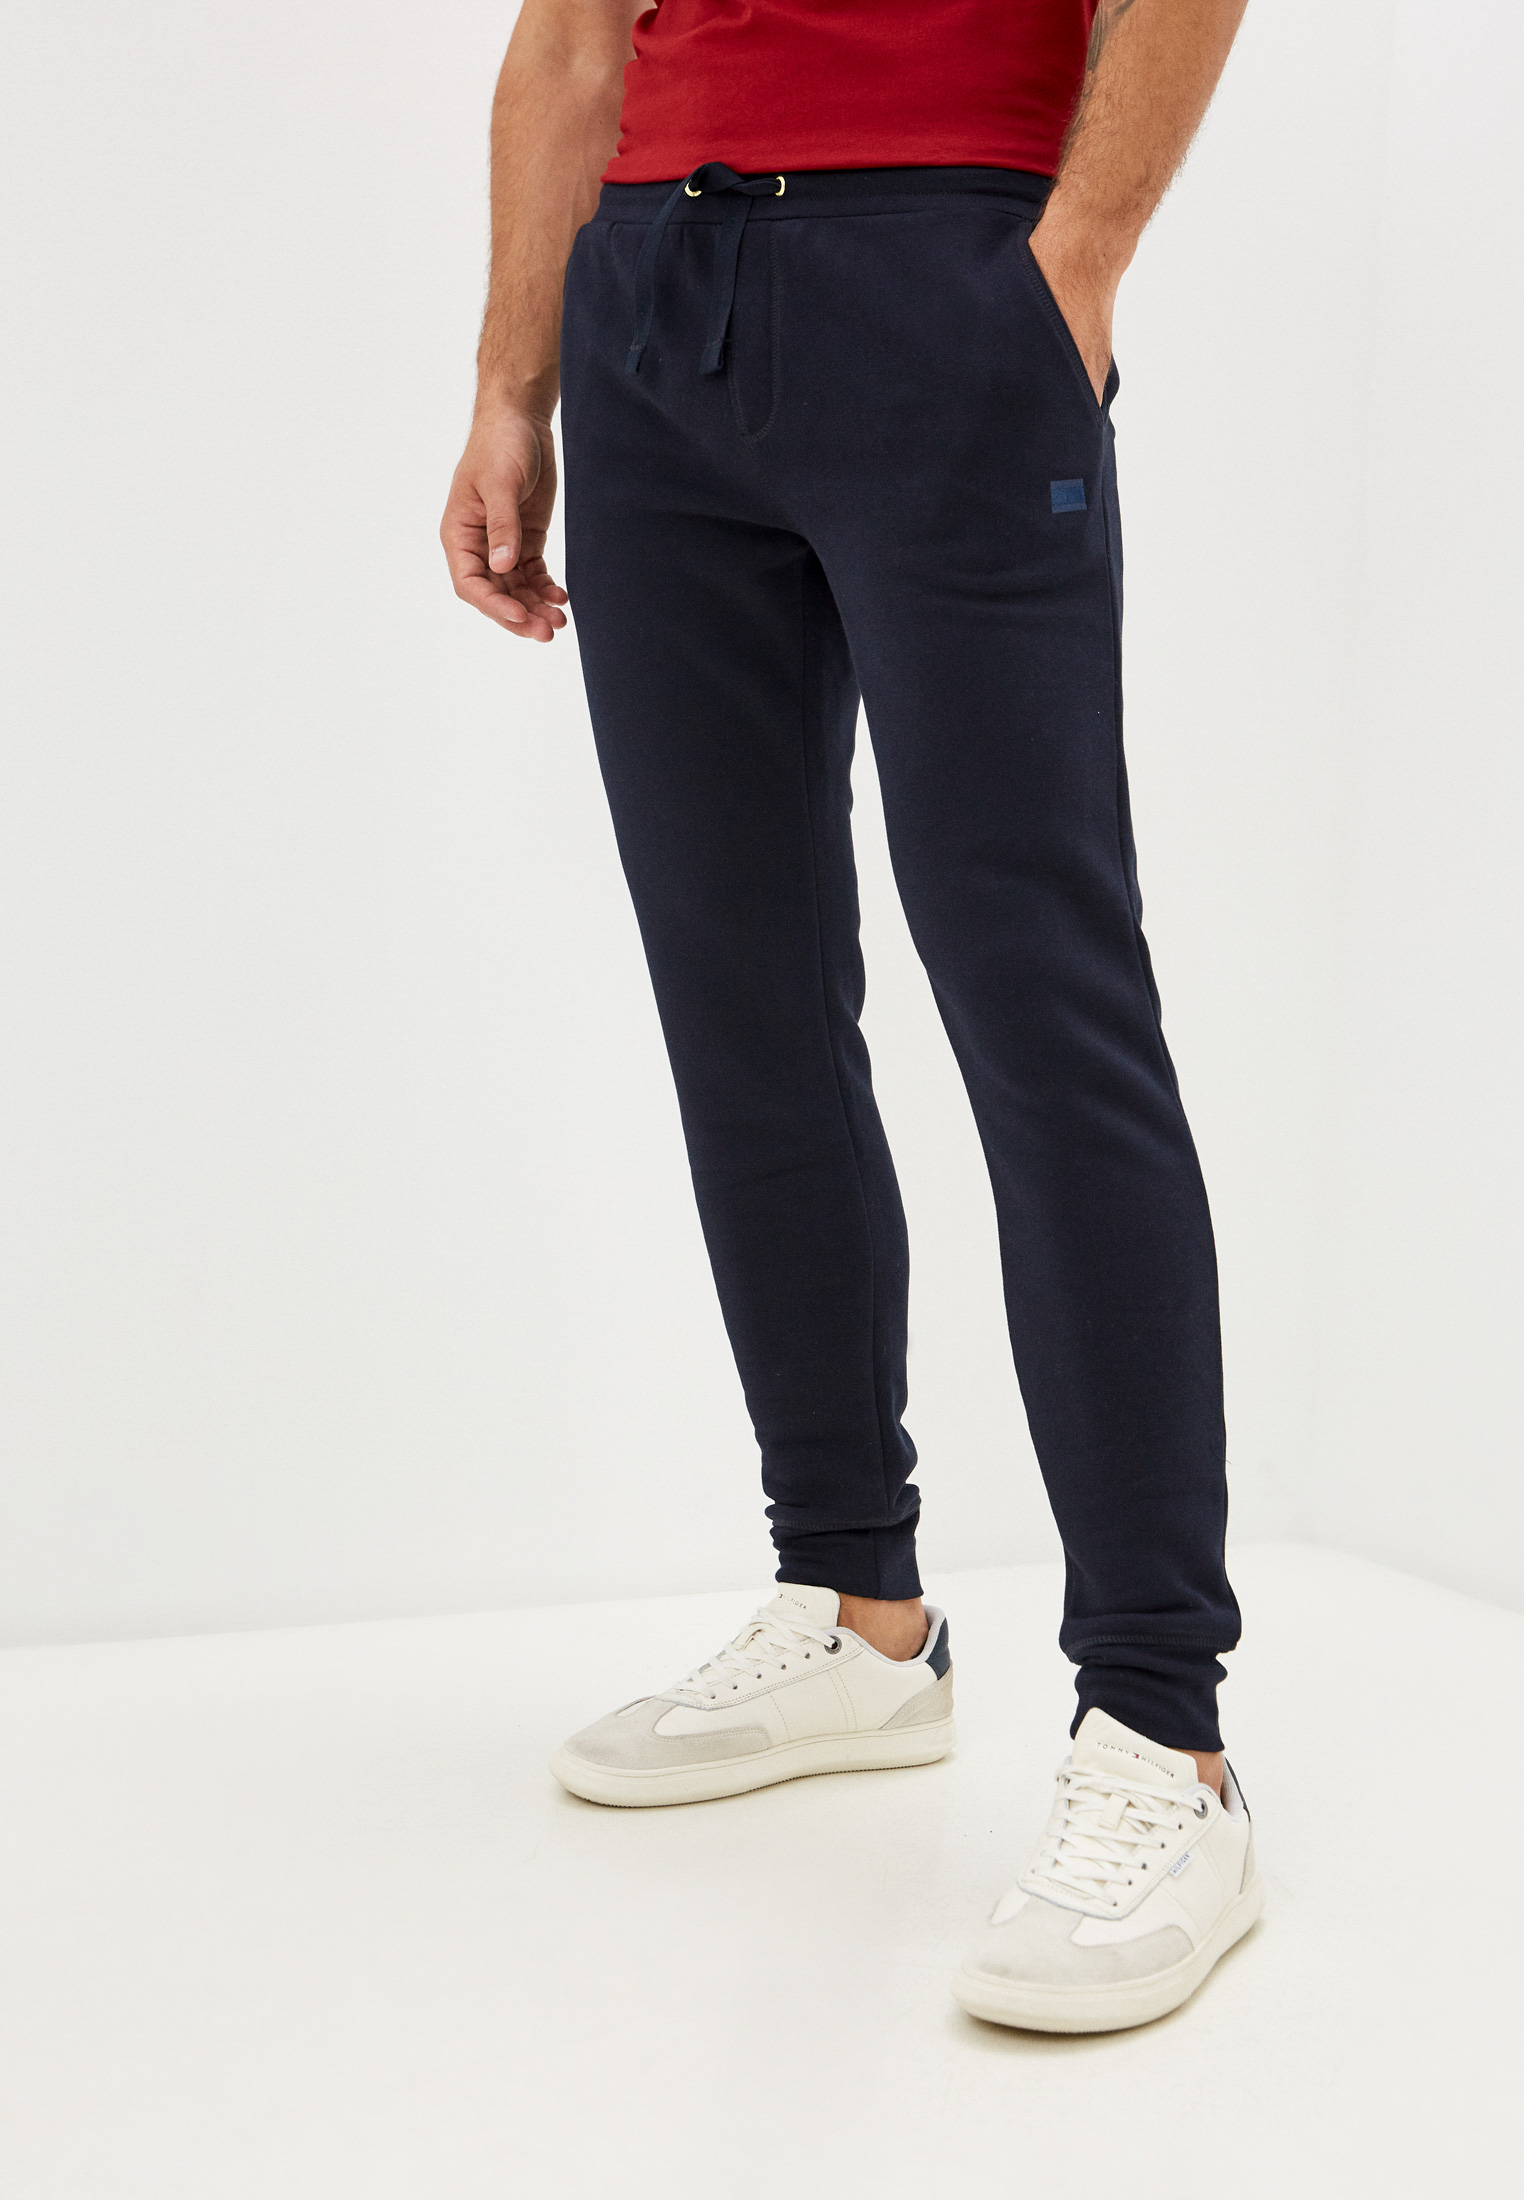 Мужские спортивные брюки Tommy Hilfiger (Томми Хилфигер) MW0MW20963